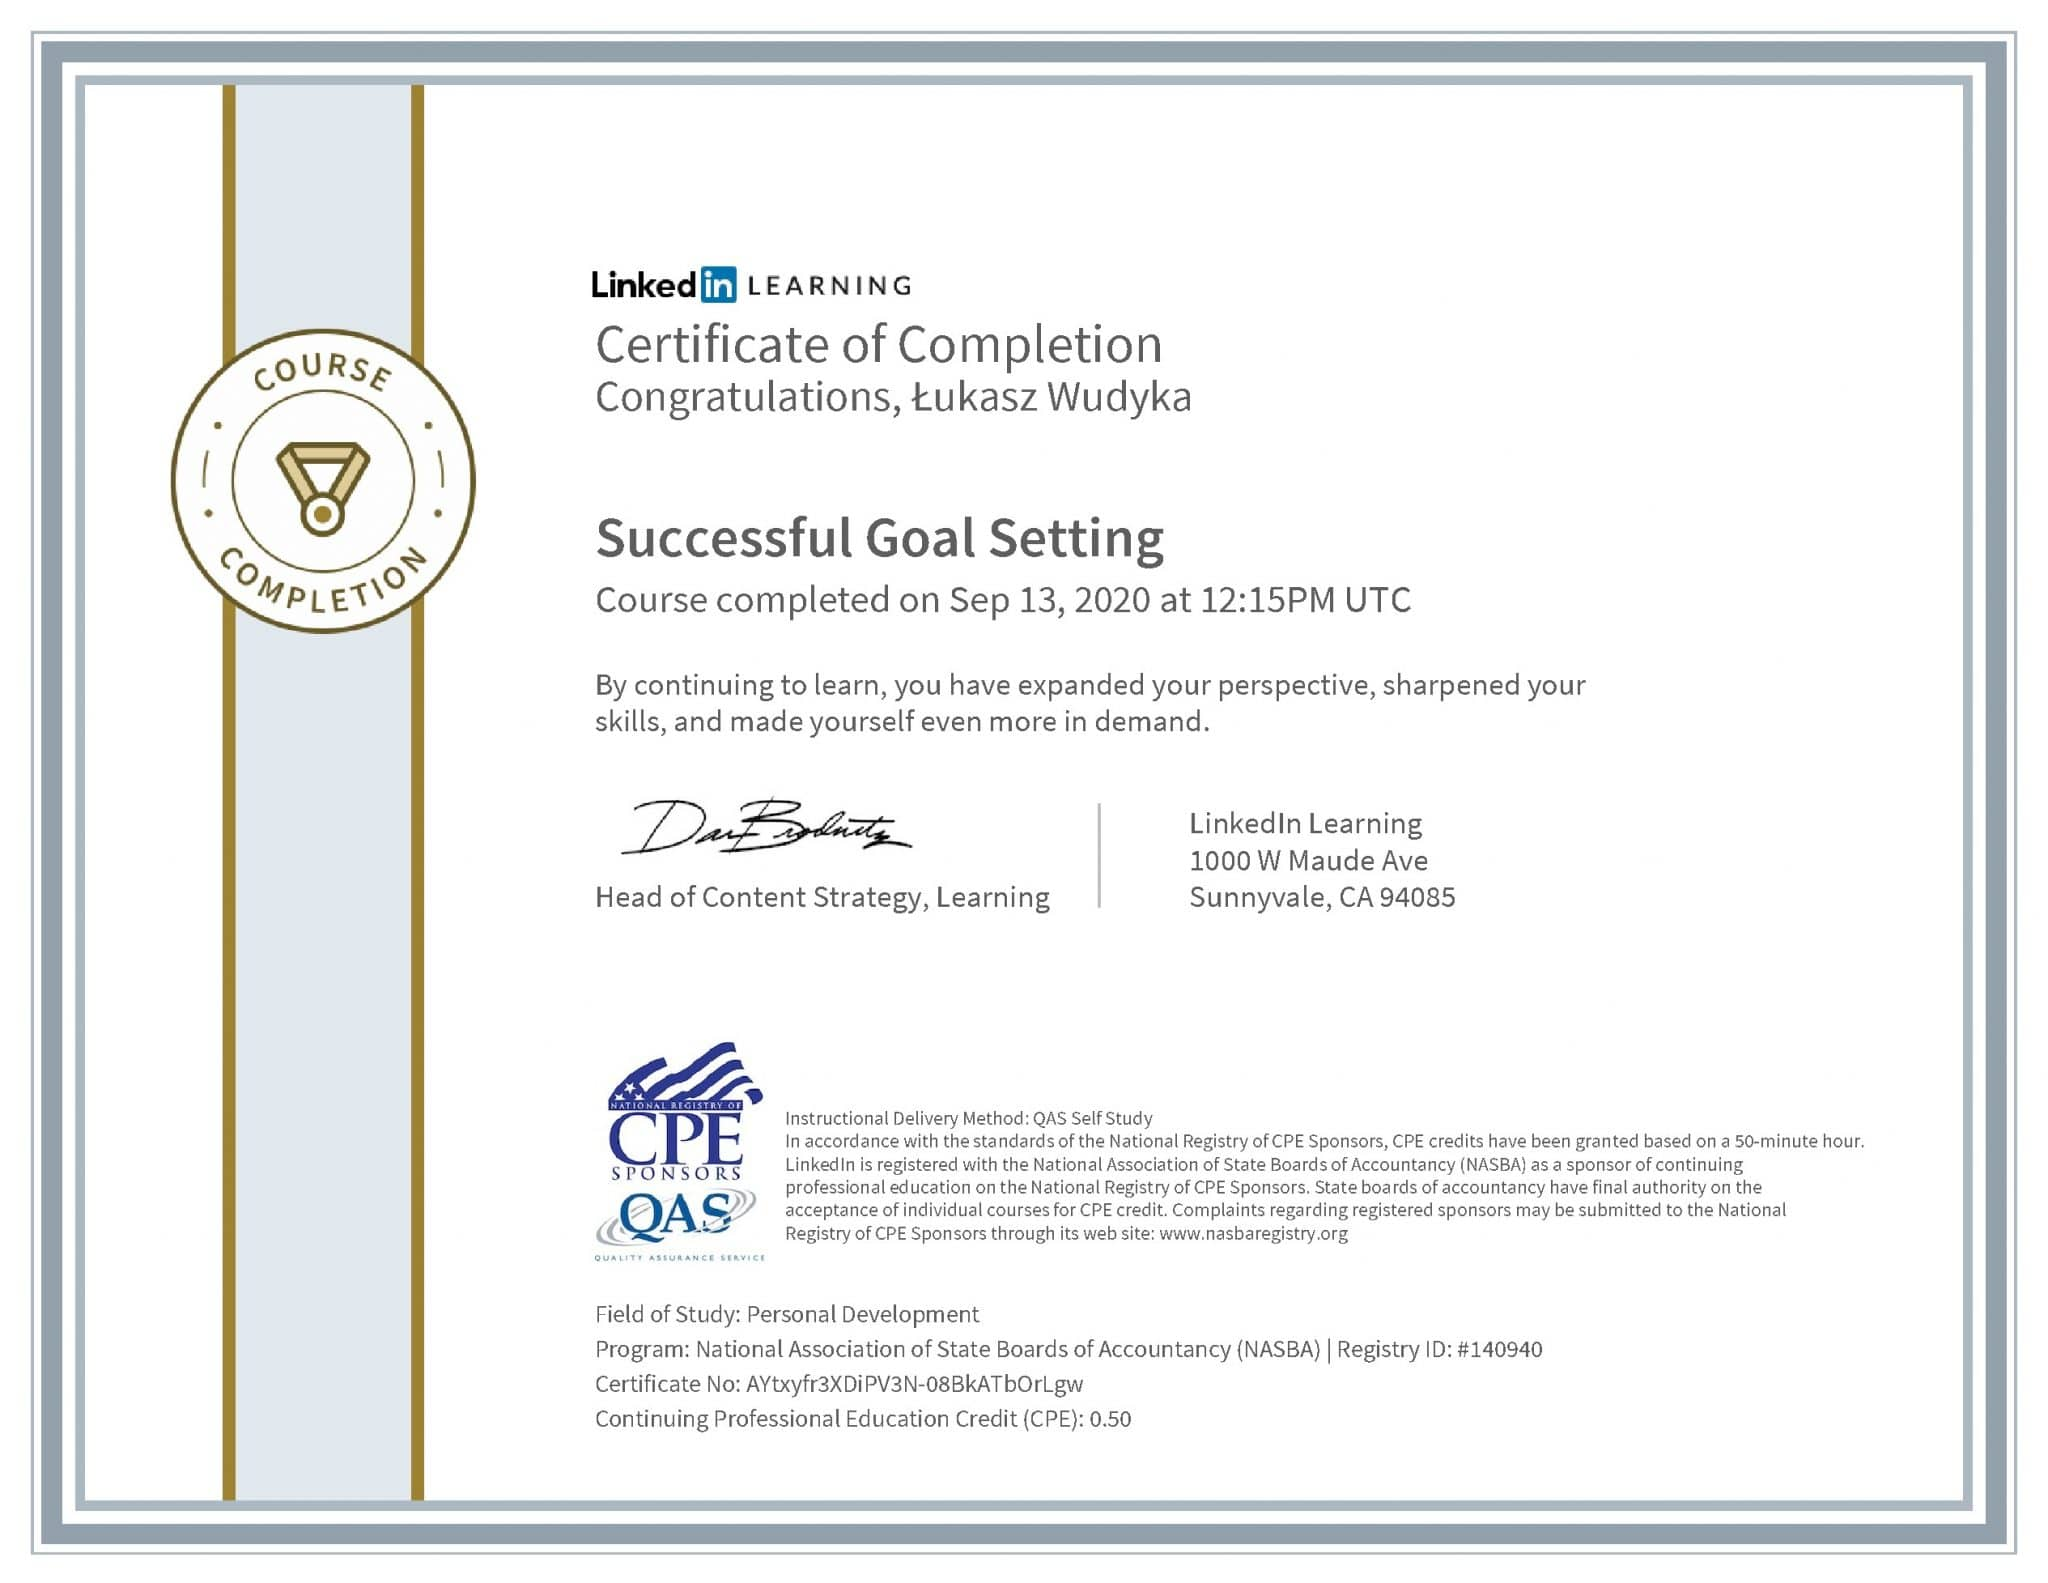 Łukasz Wudyka certyfikat LinkedIn Successful Goal Setting NASBA